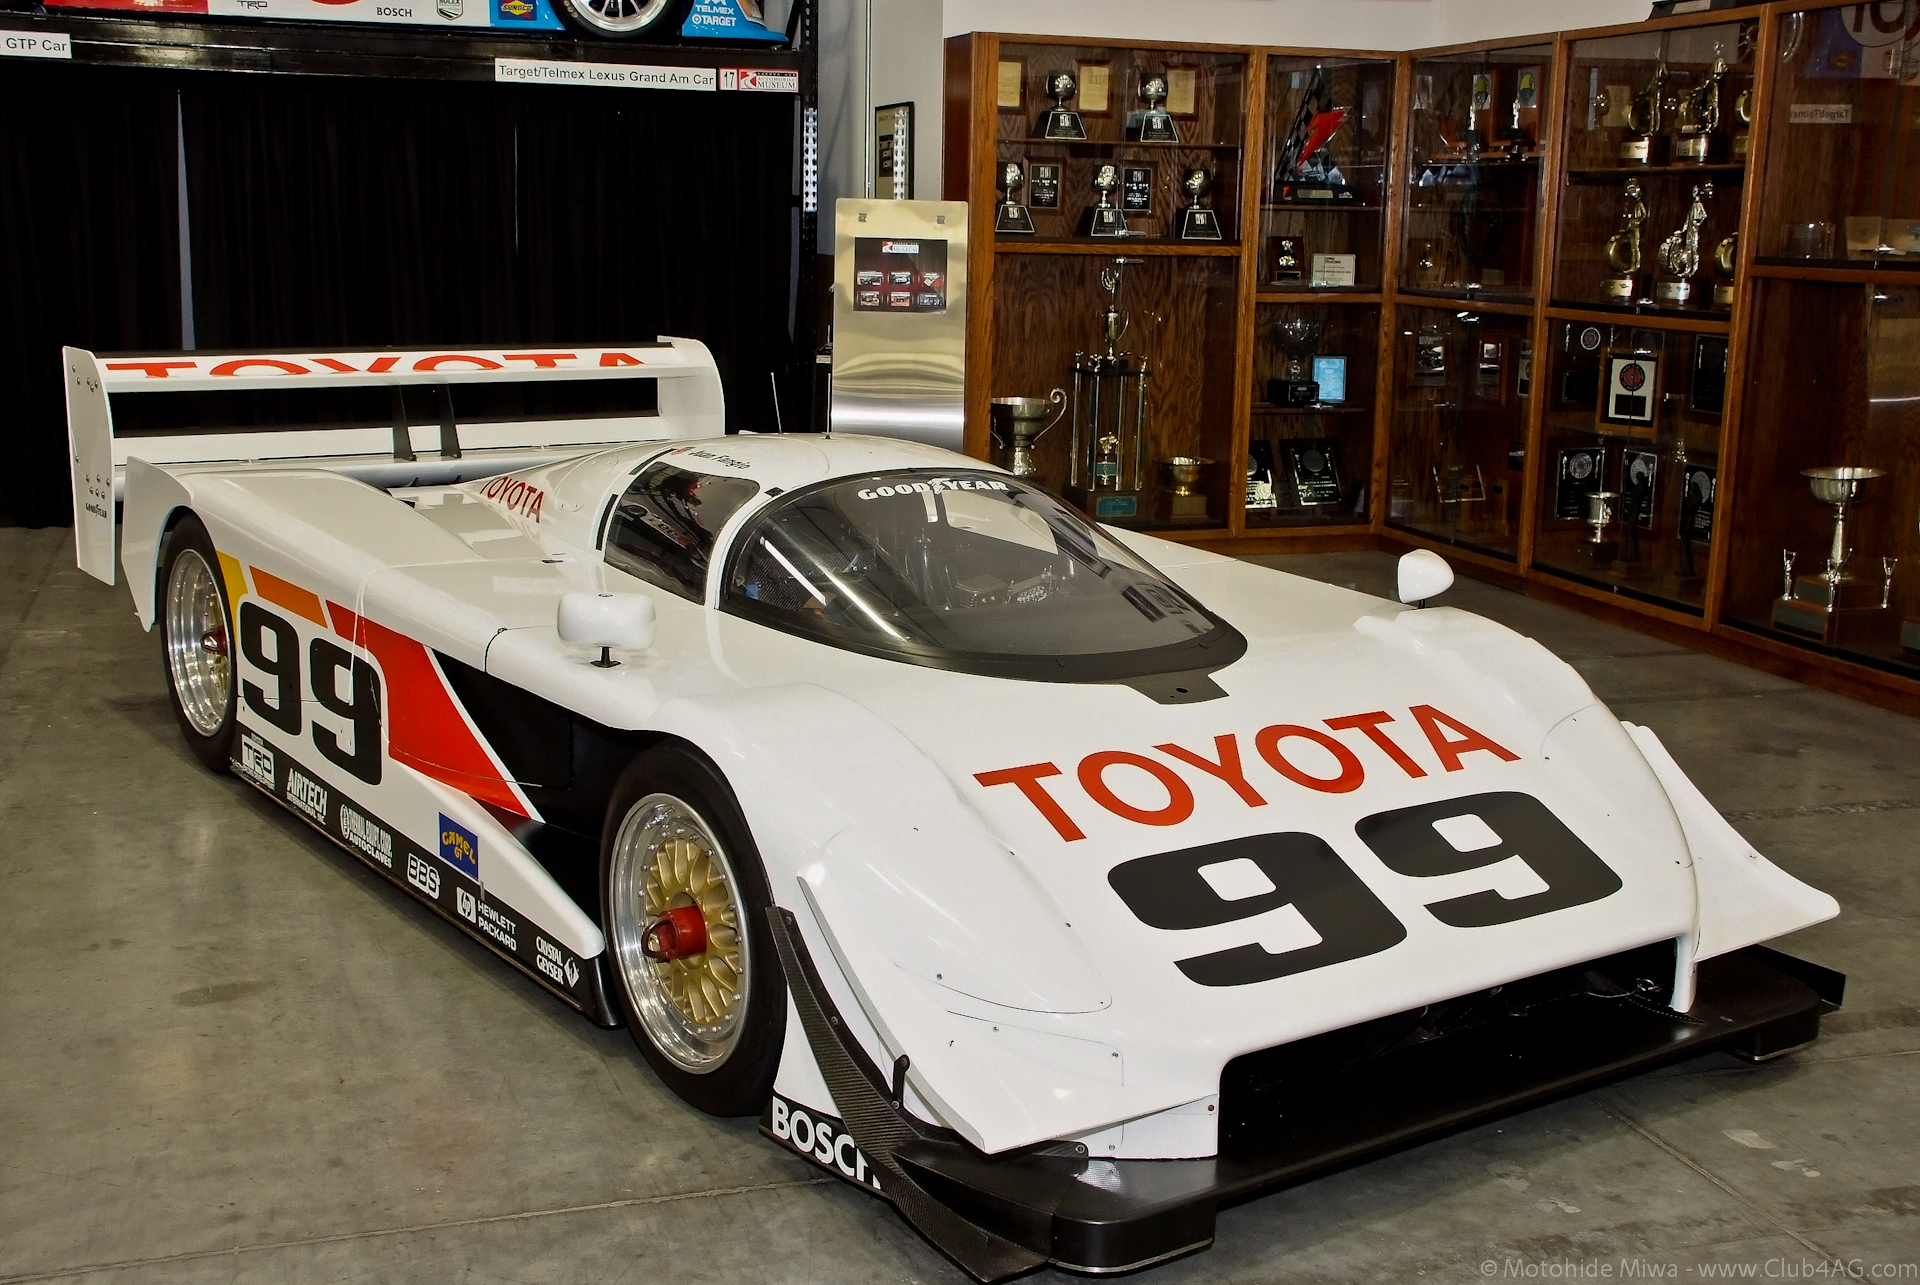 2011_11_26_Toyota_HQ-20-37_-_Flickr_-_Moto%40Club4AG.jpg